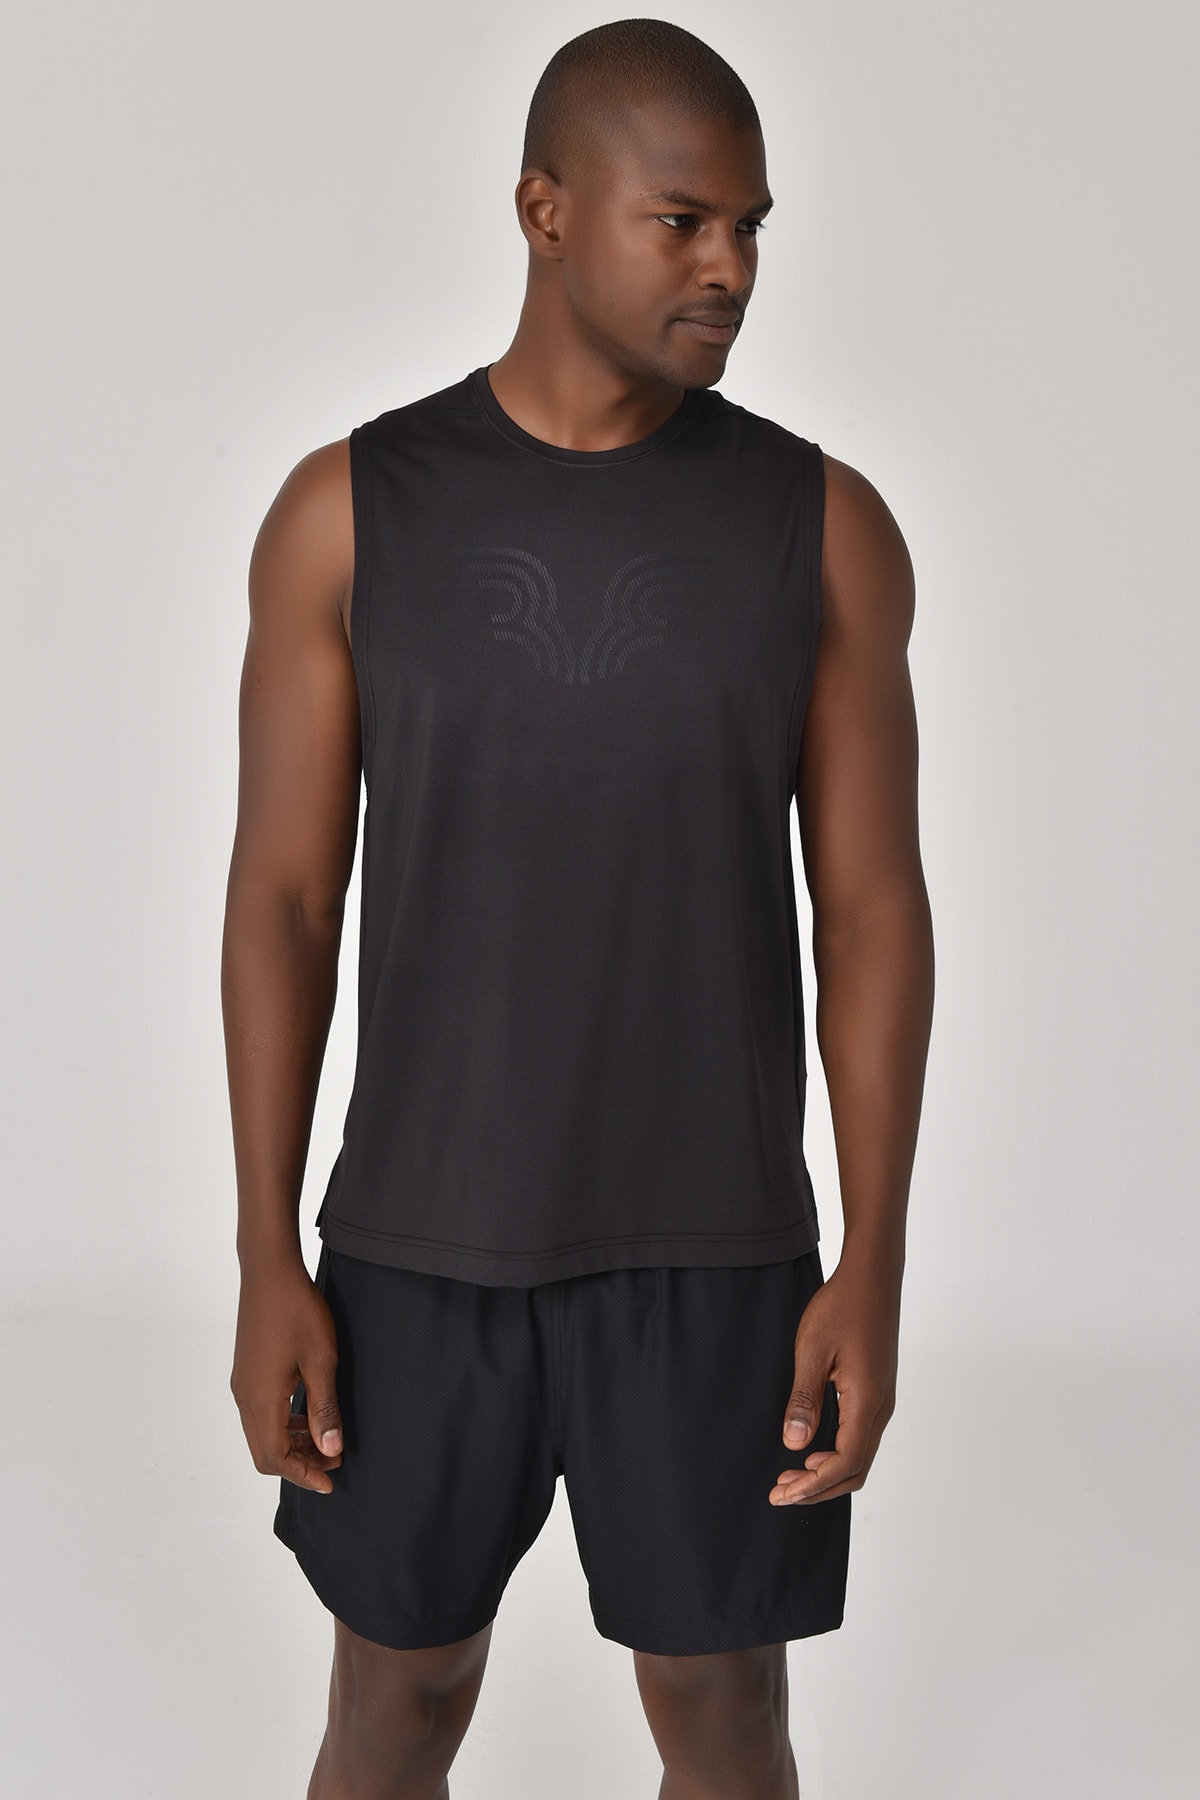 bilcee Siyah Erkek Atlet GS-8842 1